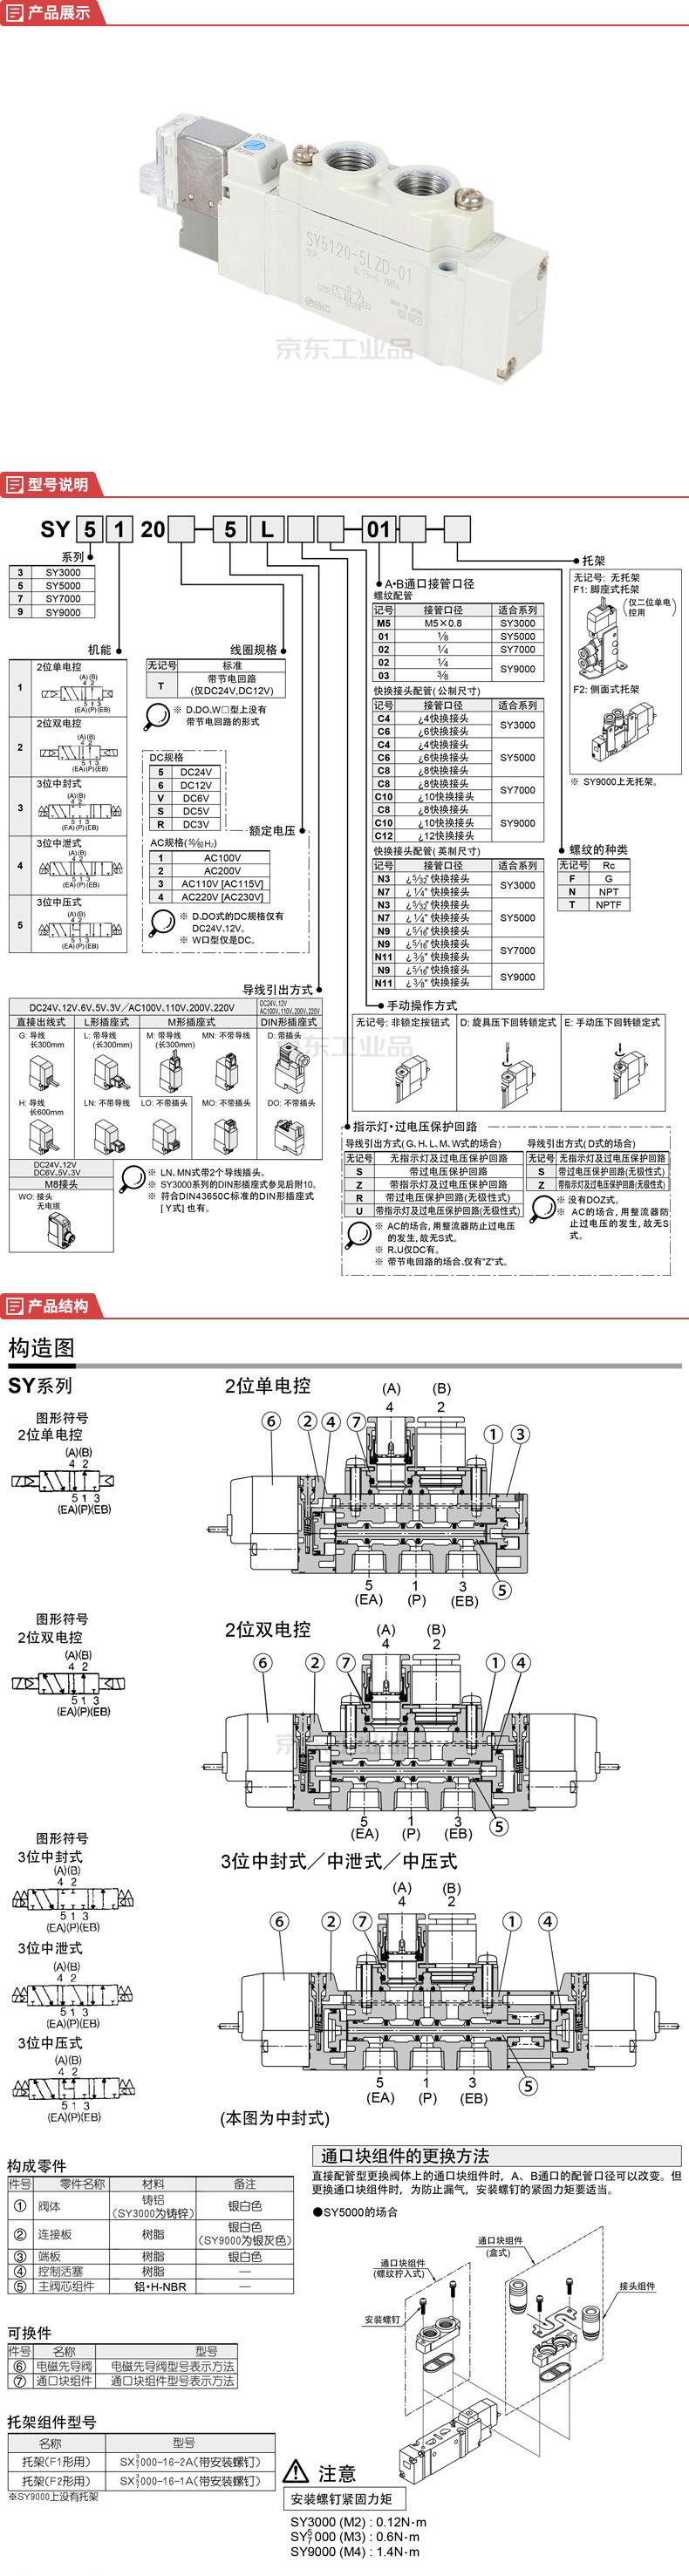 SMC 5通电磁阀,直接配管型/单体式;SY5120-5LZD-01